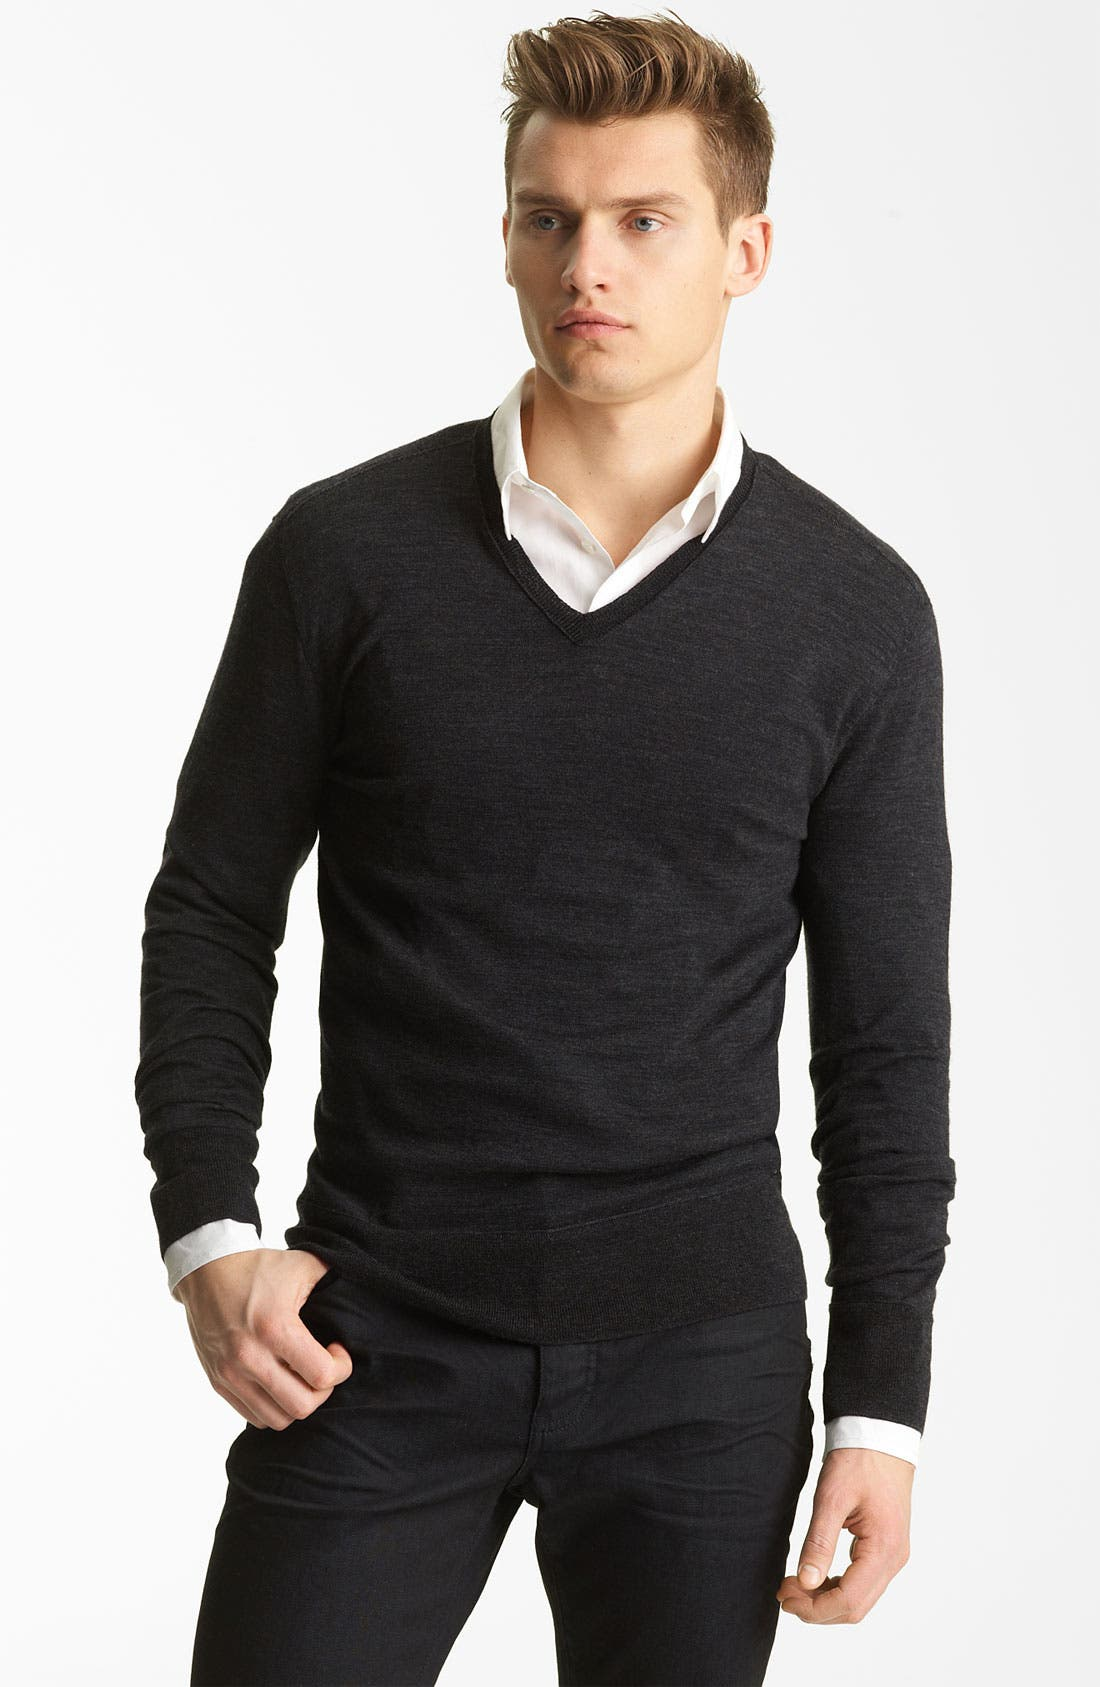 Main Image - John Varvatos Collection V-Neck Wool Knit Sweater